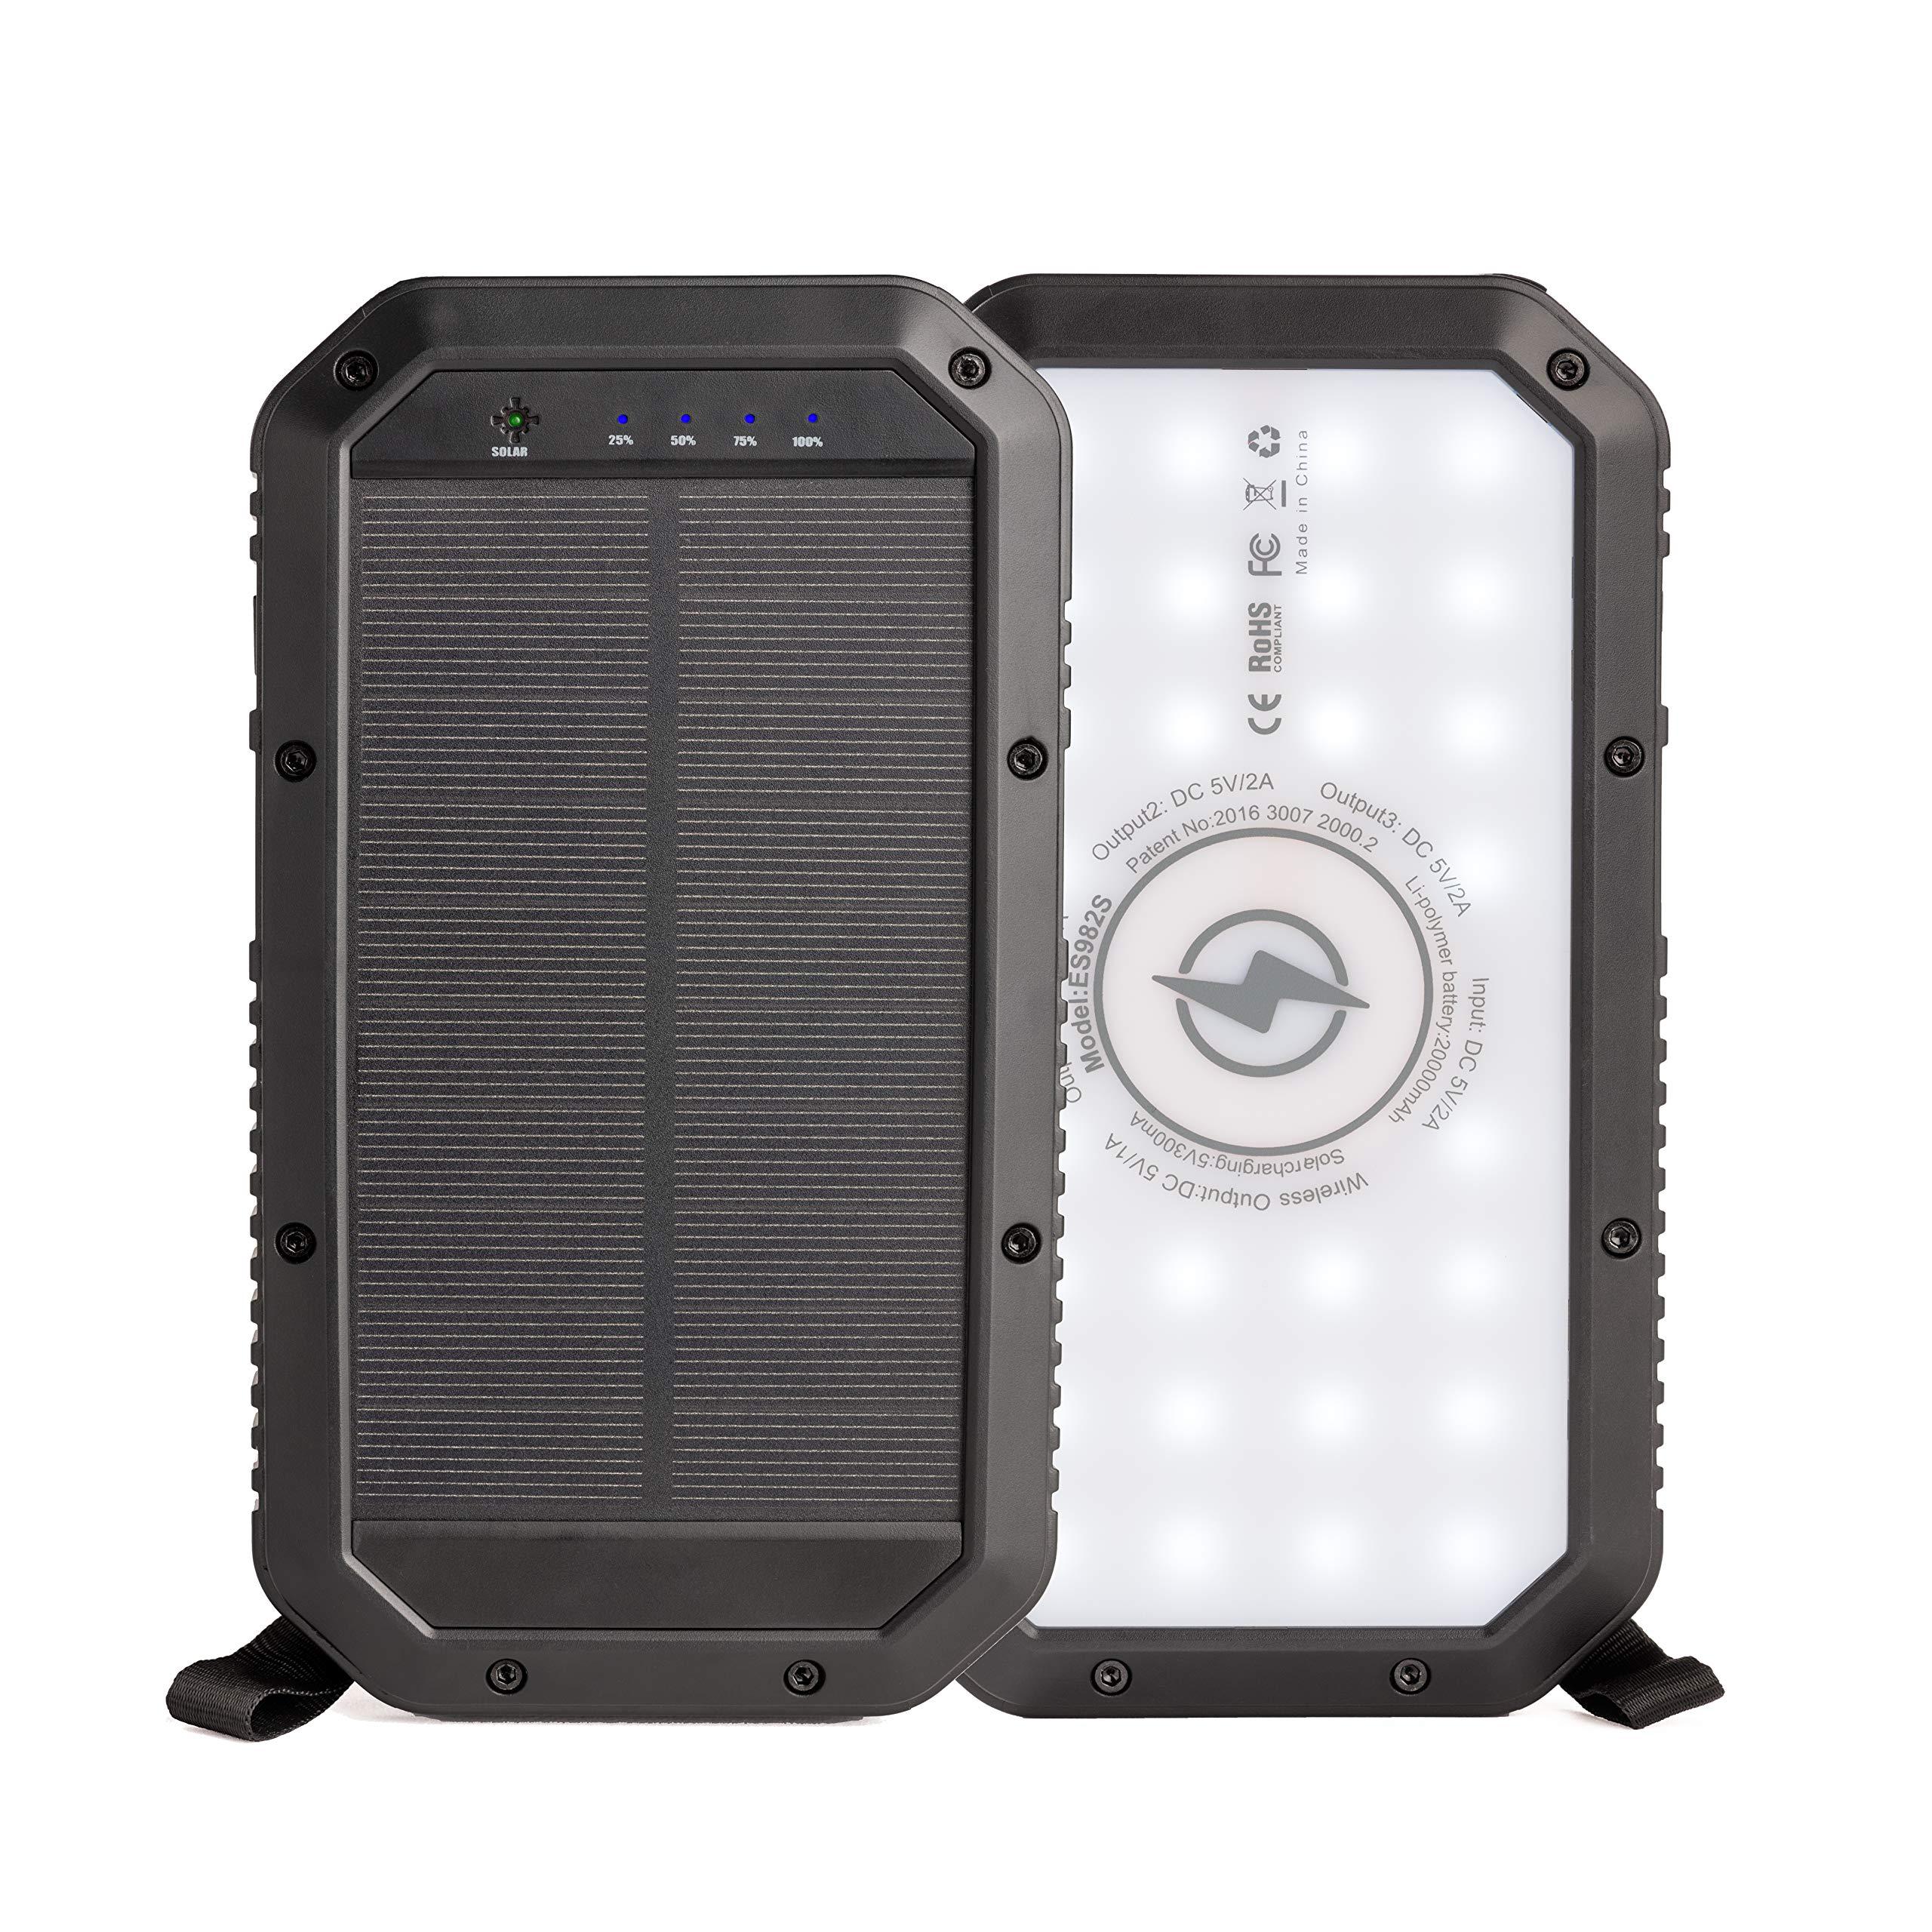 Sozo Solar Charger, Solar Power Bank, Wireless Charging, 20,000mAh Capacity Solar Phone Charger, Three USB Ports, Ultra Bright LED Flashlight with Three Settings, Portable Power Bank, Solar Battery by SOZO